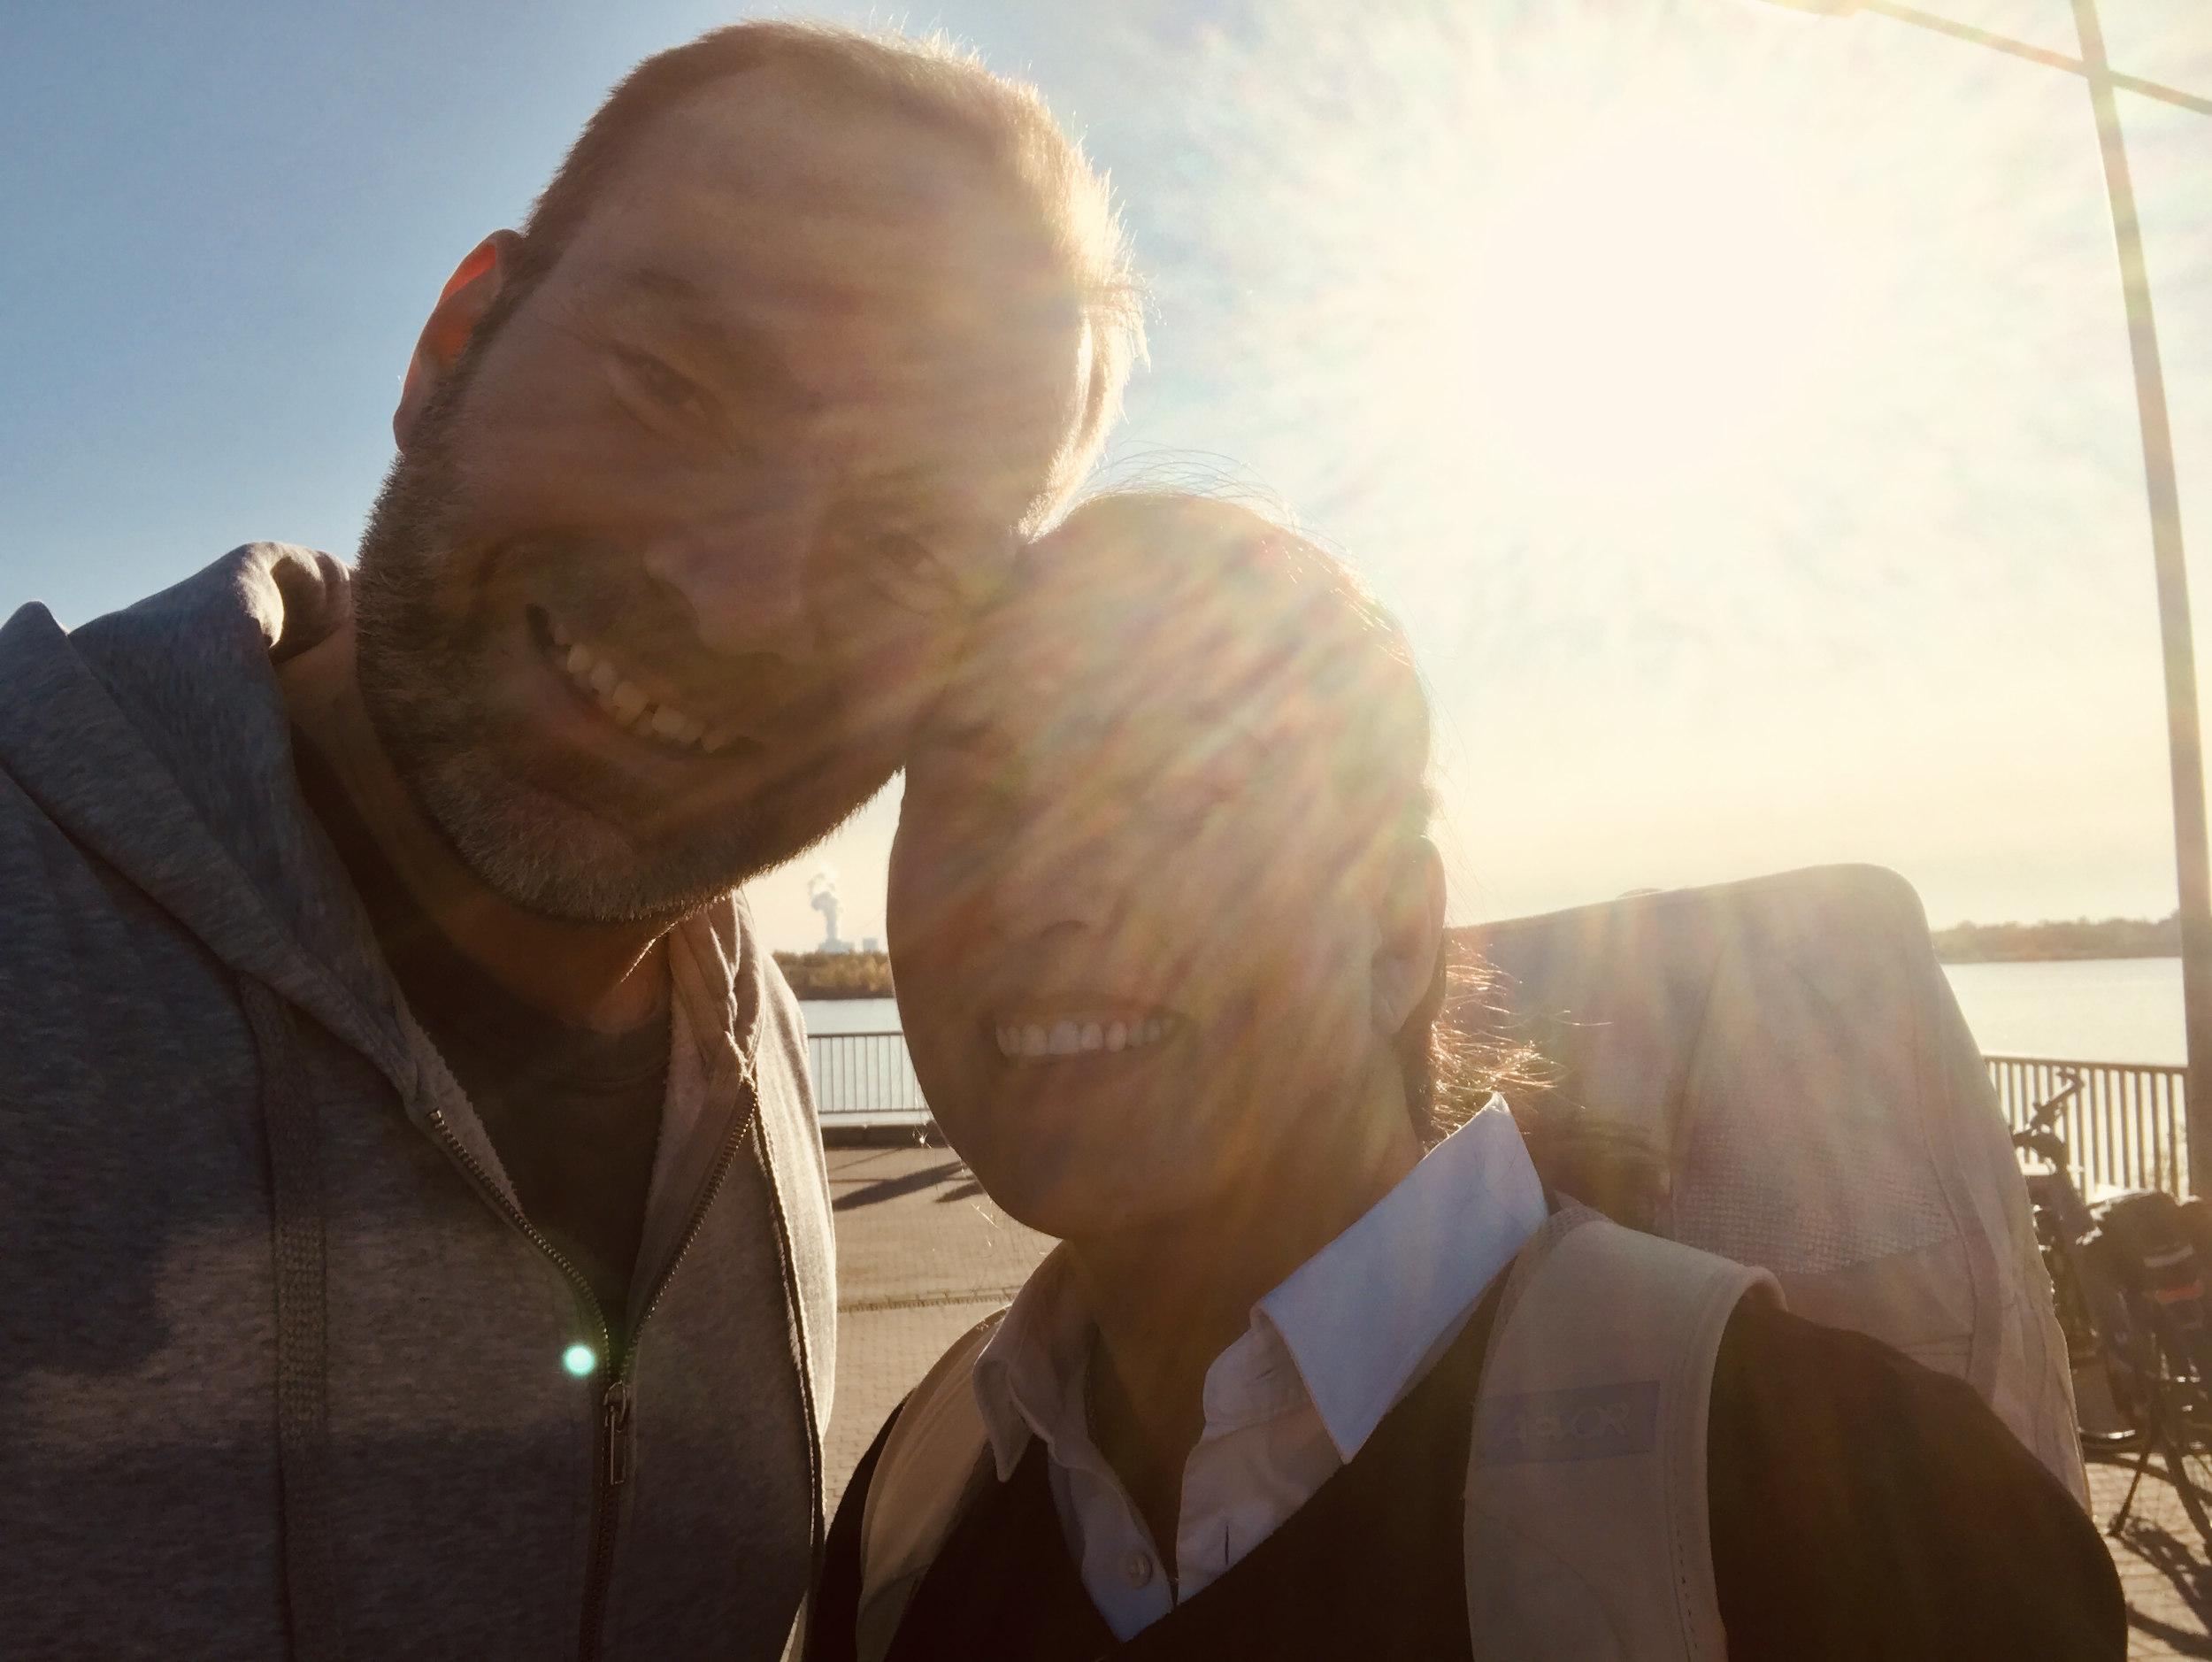 Eva und Sven im November 2020